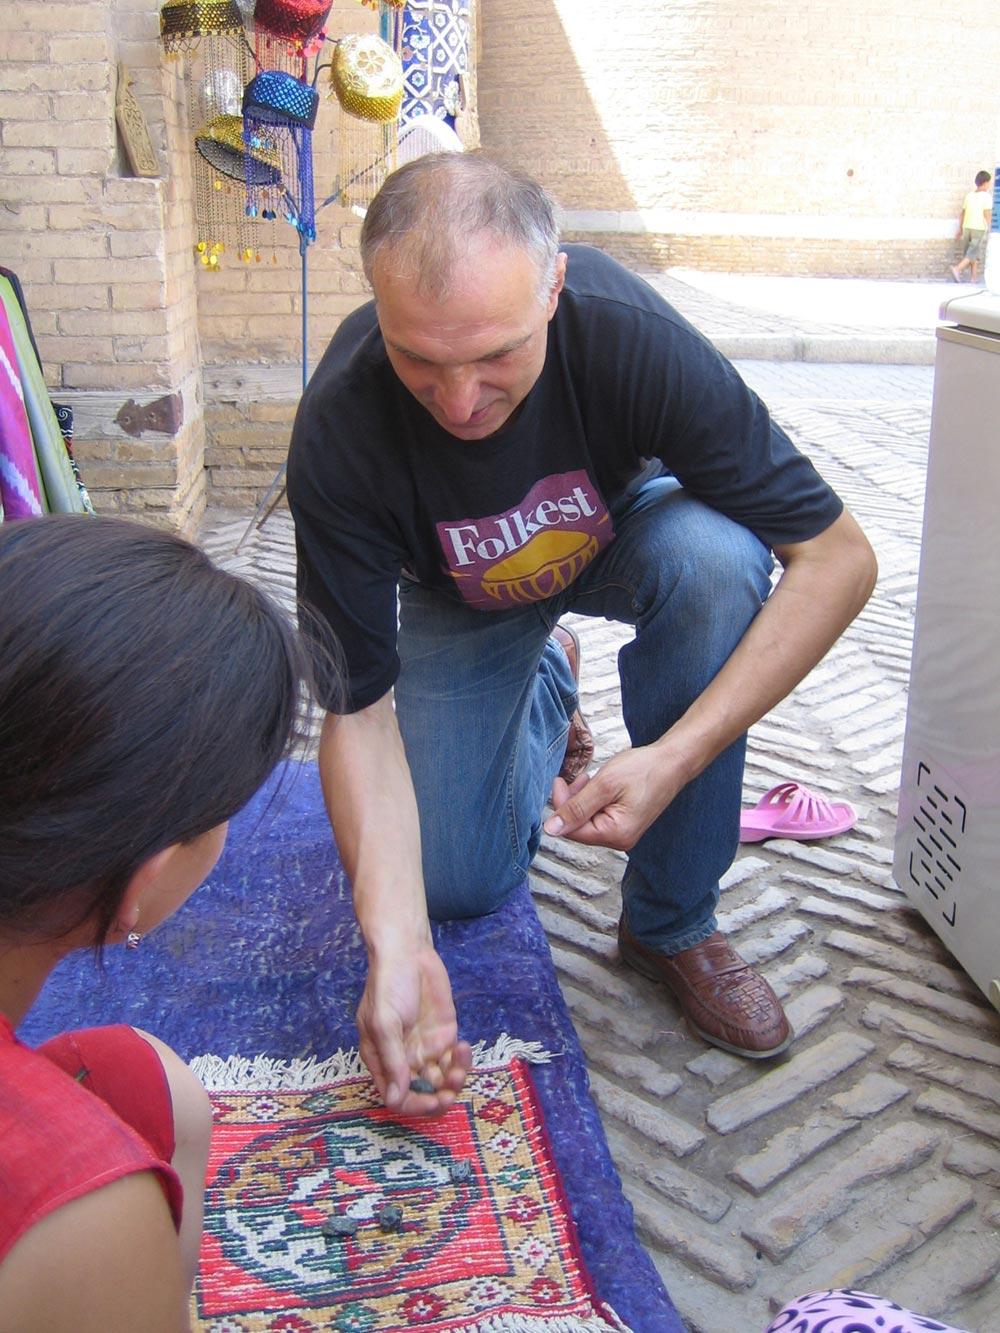 Joyside Khiva Sergio Jeio Freschi racconto di viaggio